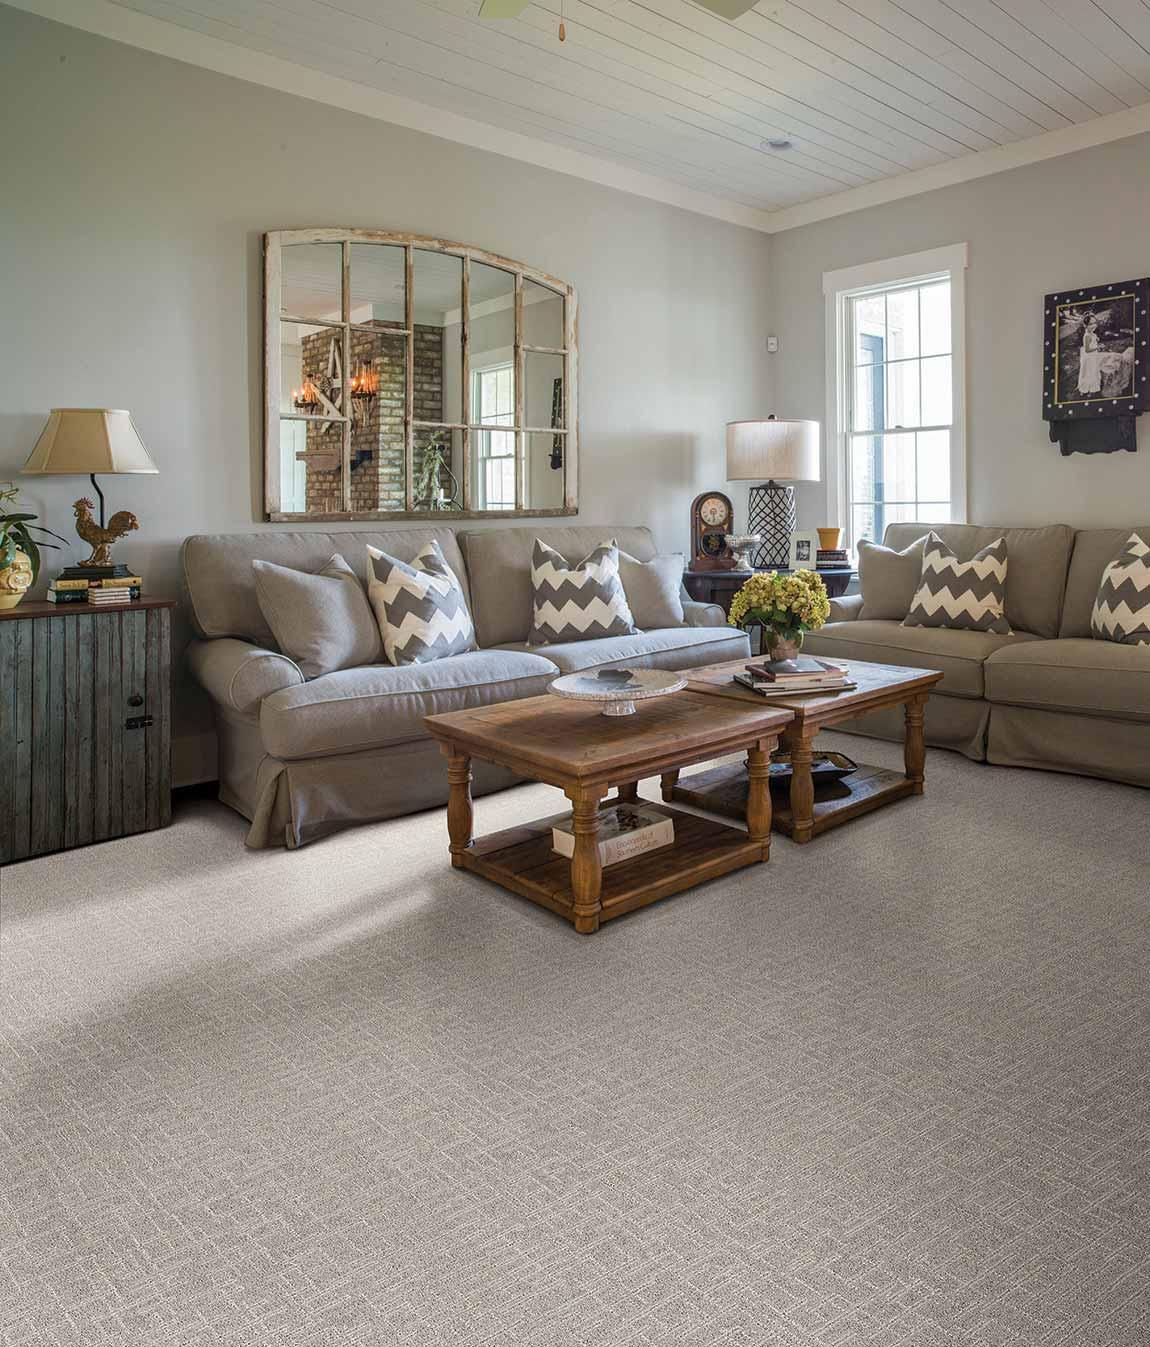 Carpeted Rustic Farmhouse Living Room Flooring Designs ...